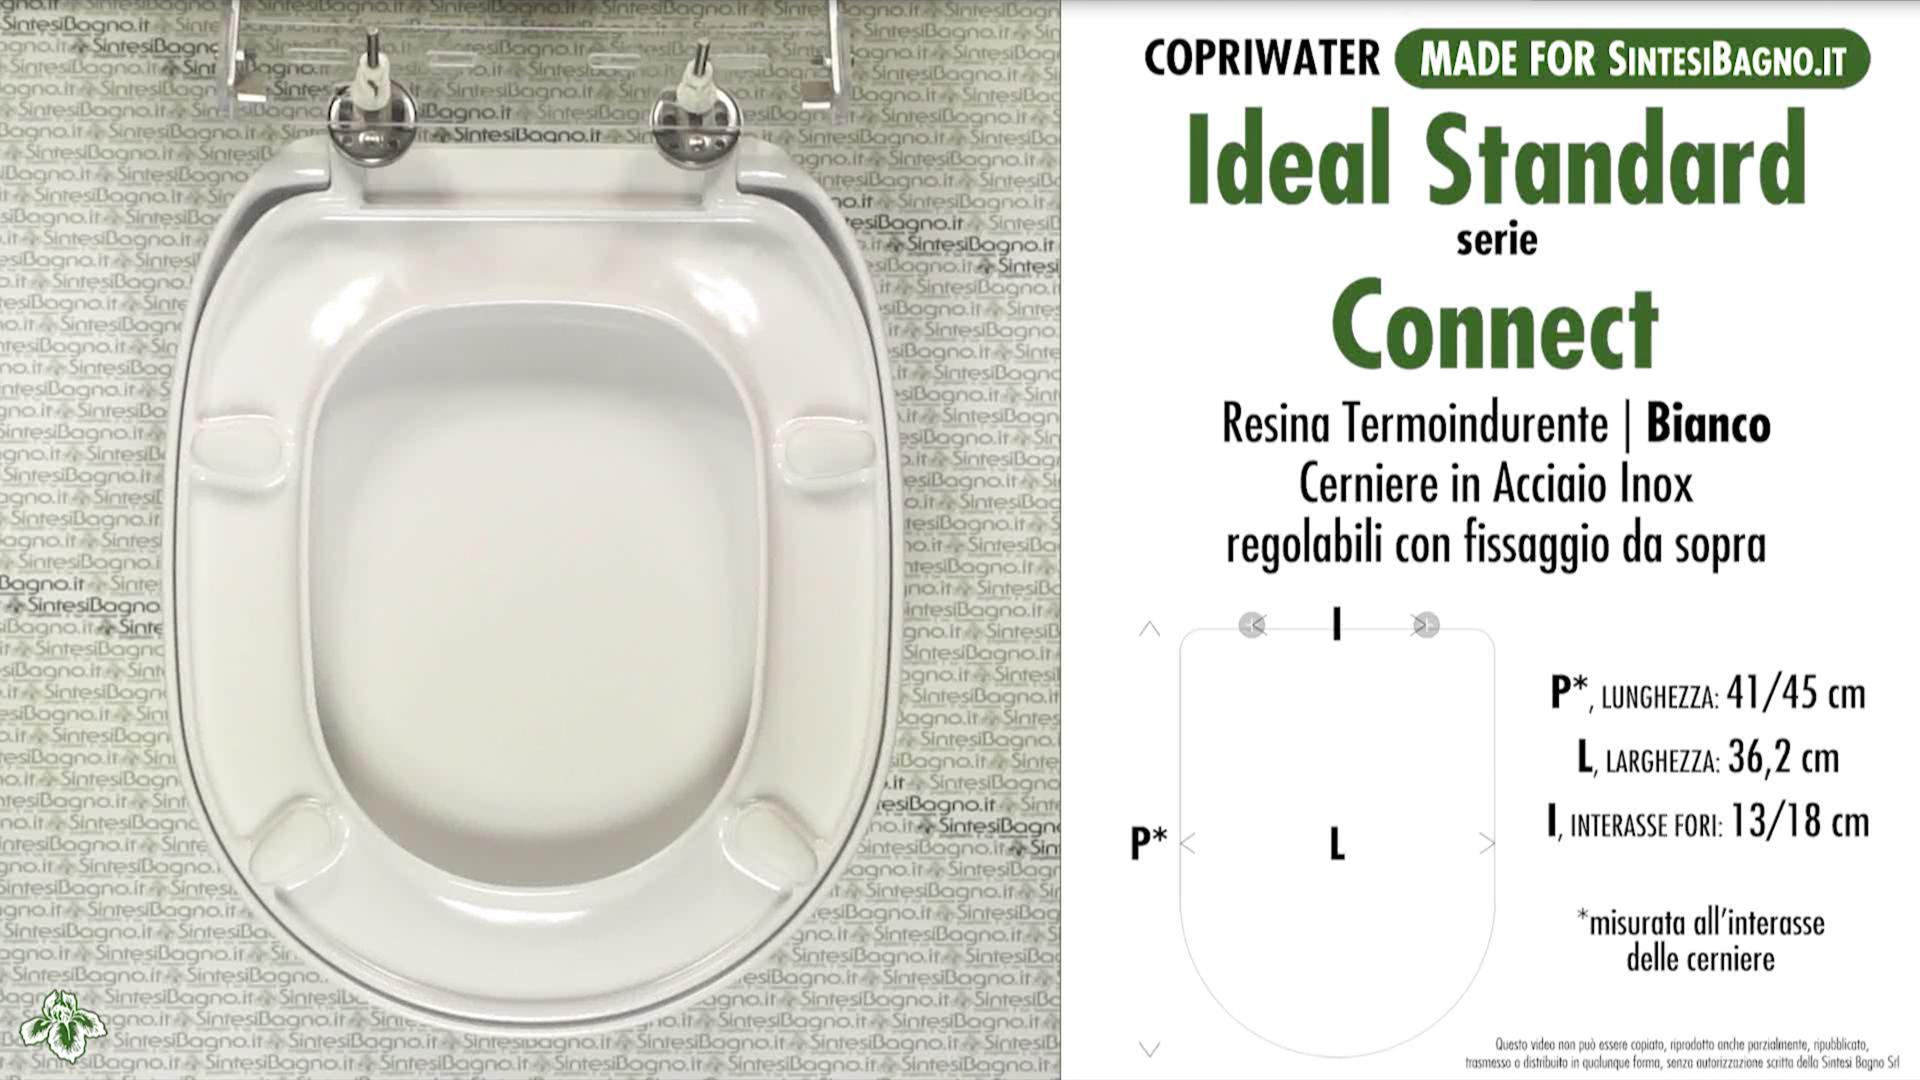 schede tecniche misure copriwater ideal standard serie connect. Black Bedroom Furniture Sets. Home Design Ideas